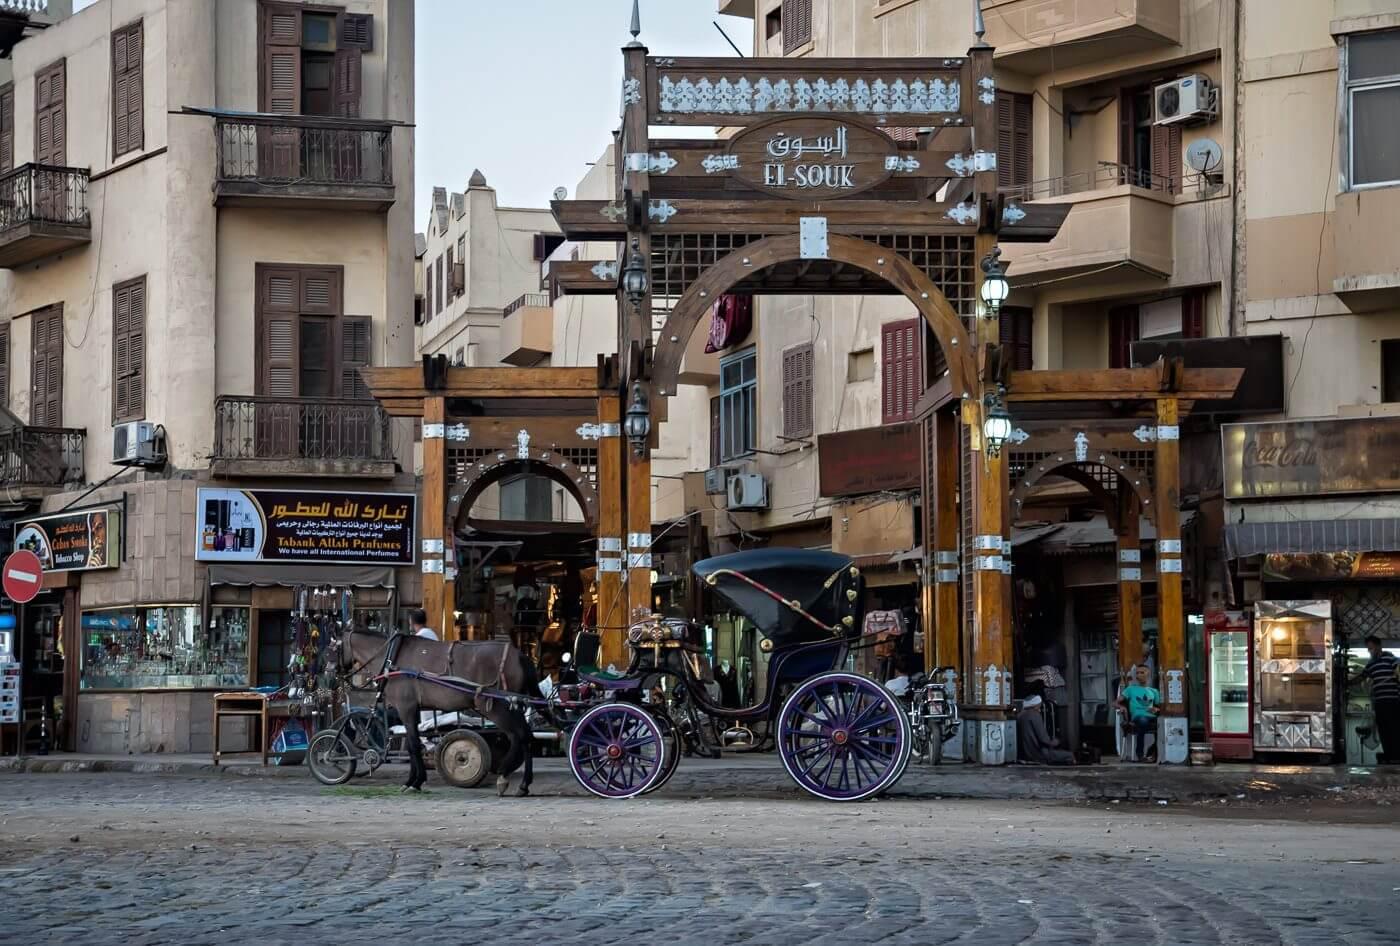 El Souk market, Luxor, Egypt - Photo by Zed Sindelar of CuriousZed Photography